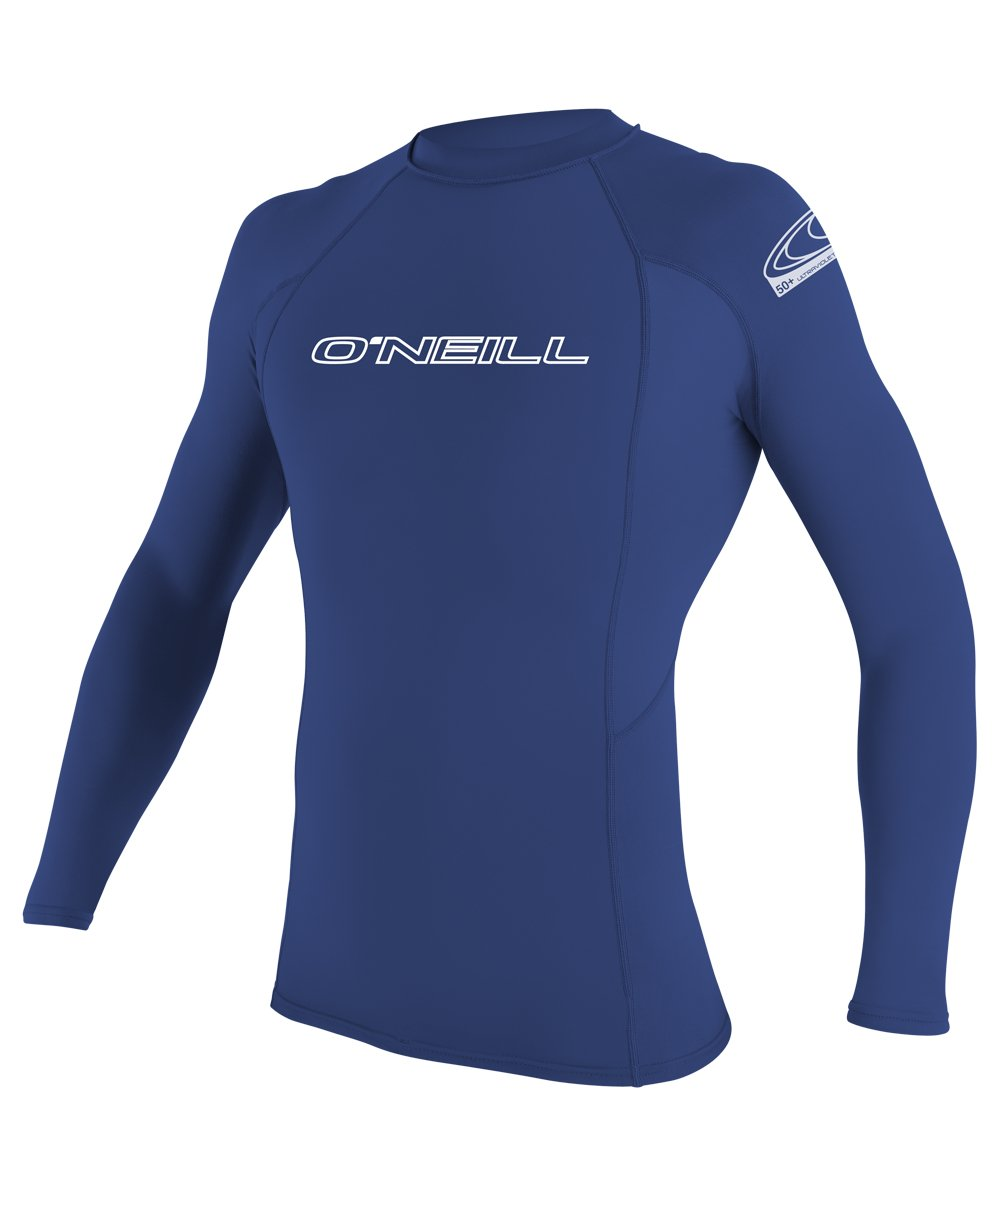 O'Neill Men's Basic Skins UPF 50+ Long Sleeve Rash Guard, Pacific, Small